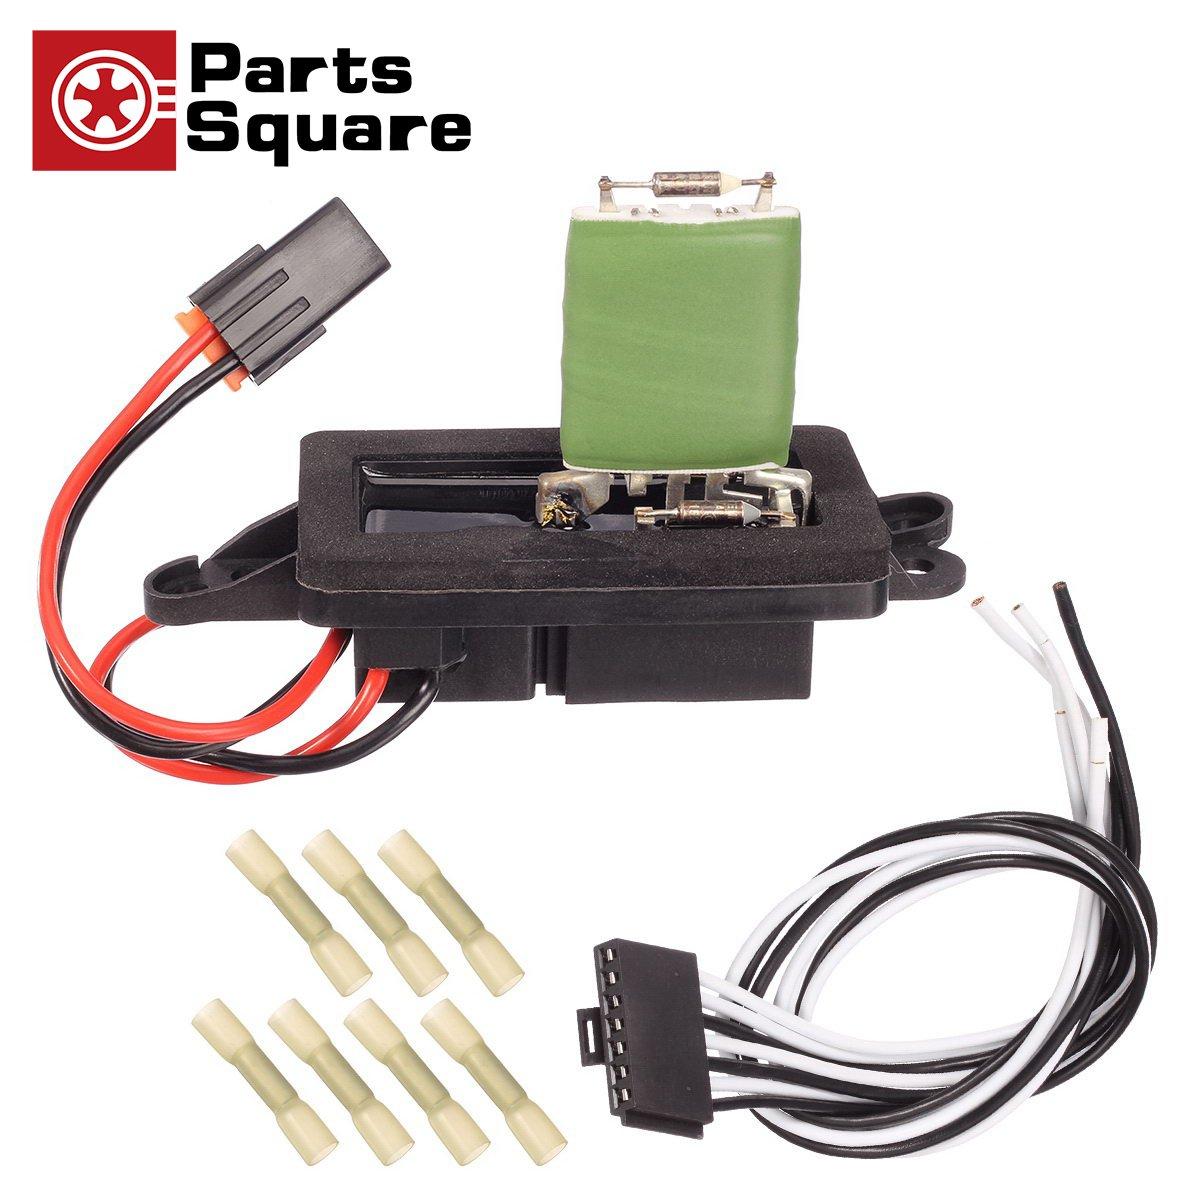 PartsSquare 89019088 Manual Blower Motor Resistor Replacement for 2002 2003 2004 2005 2006 CHEVROLET AVALANCHE 1500 2500 GMC YUKON XL 1500 2002 2003 2004 2005 2006 2007 CHEVROLET SUBURBAN 1500 2500